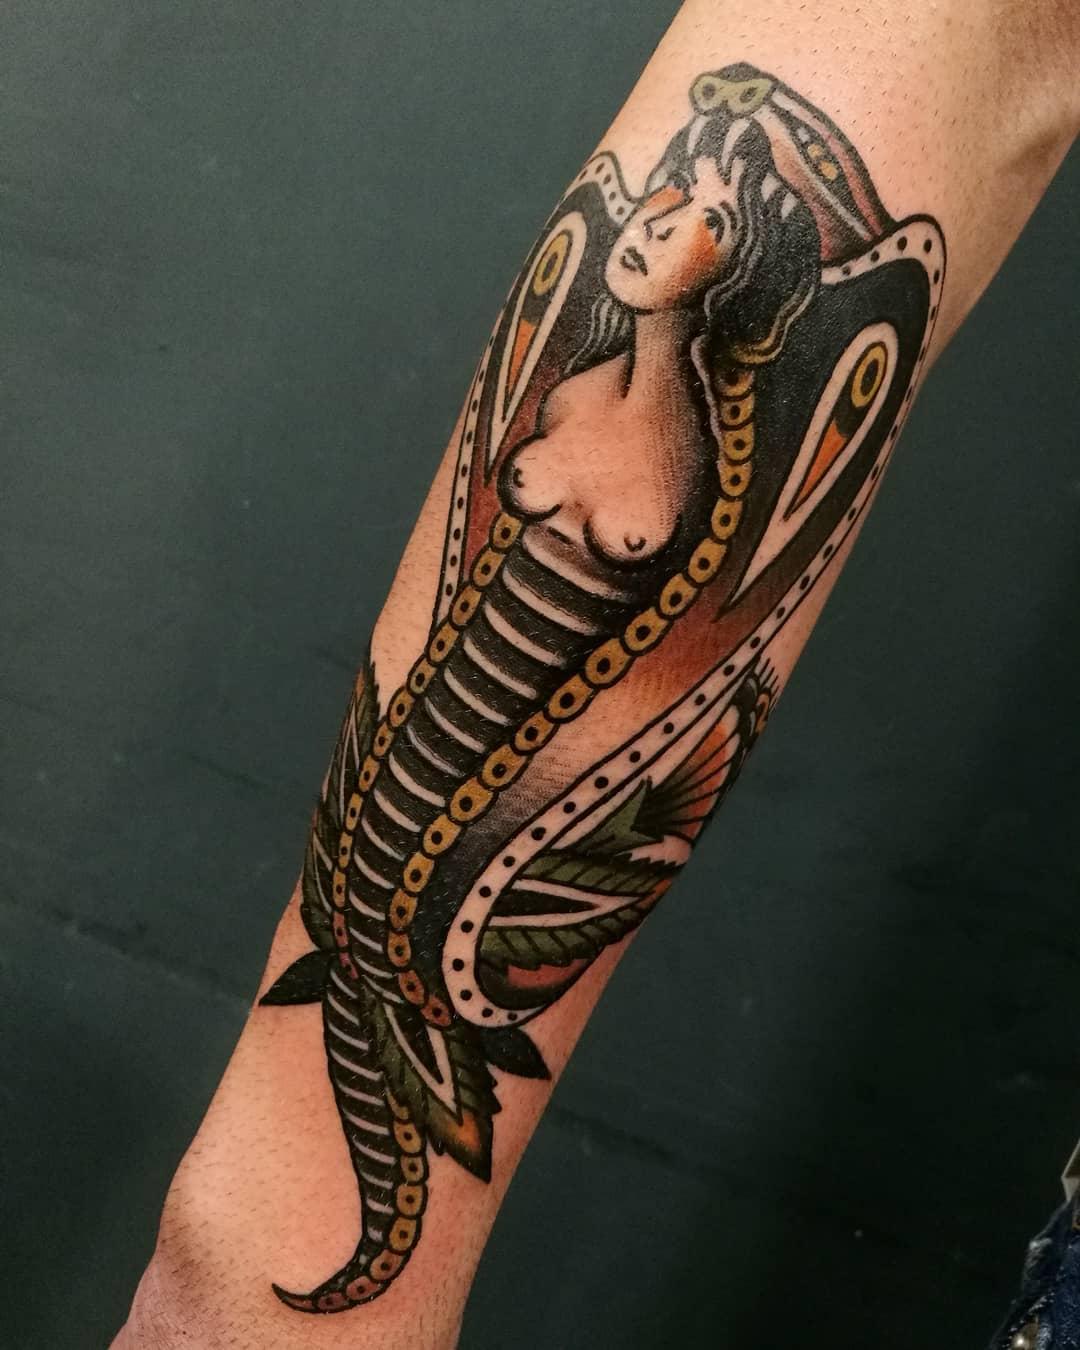 alejandro.tattooer_2